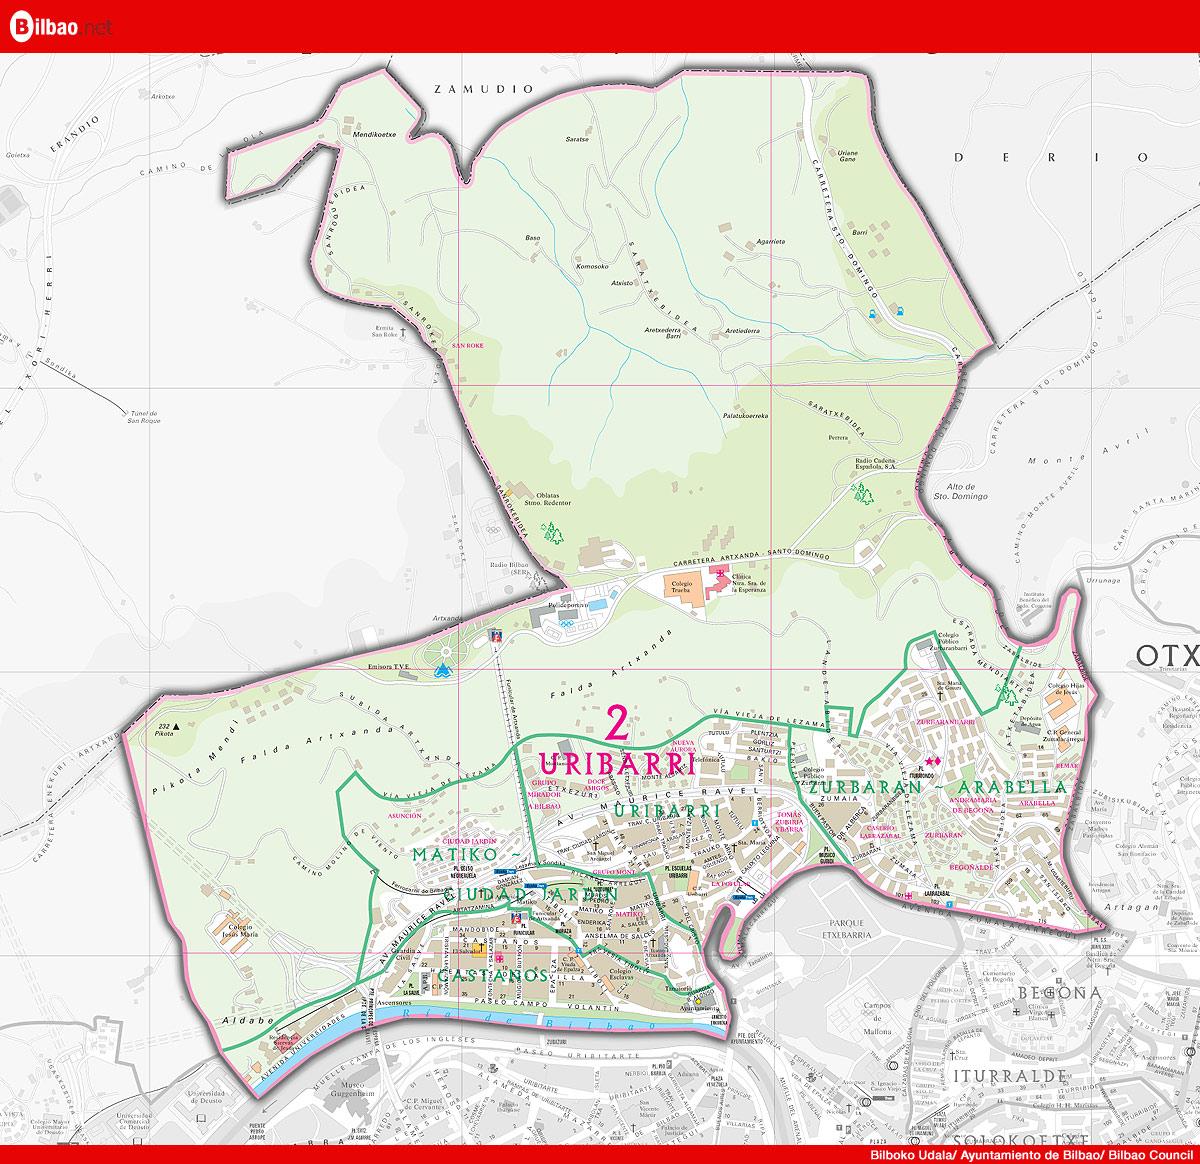 Uríbarri district